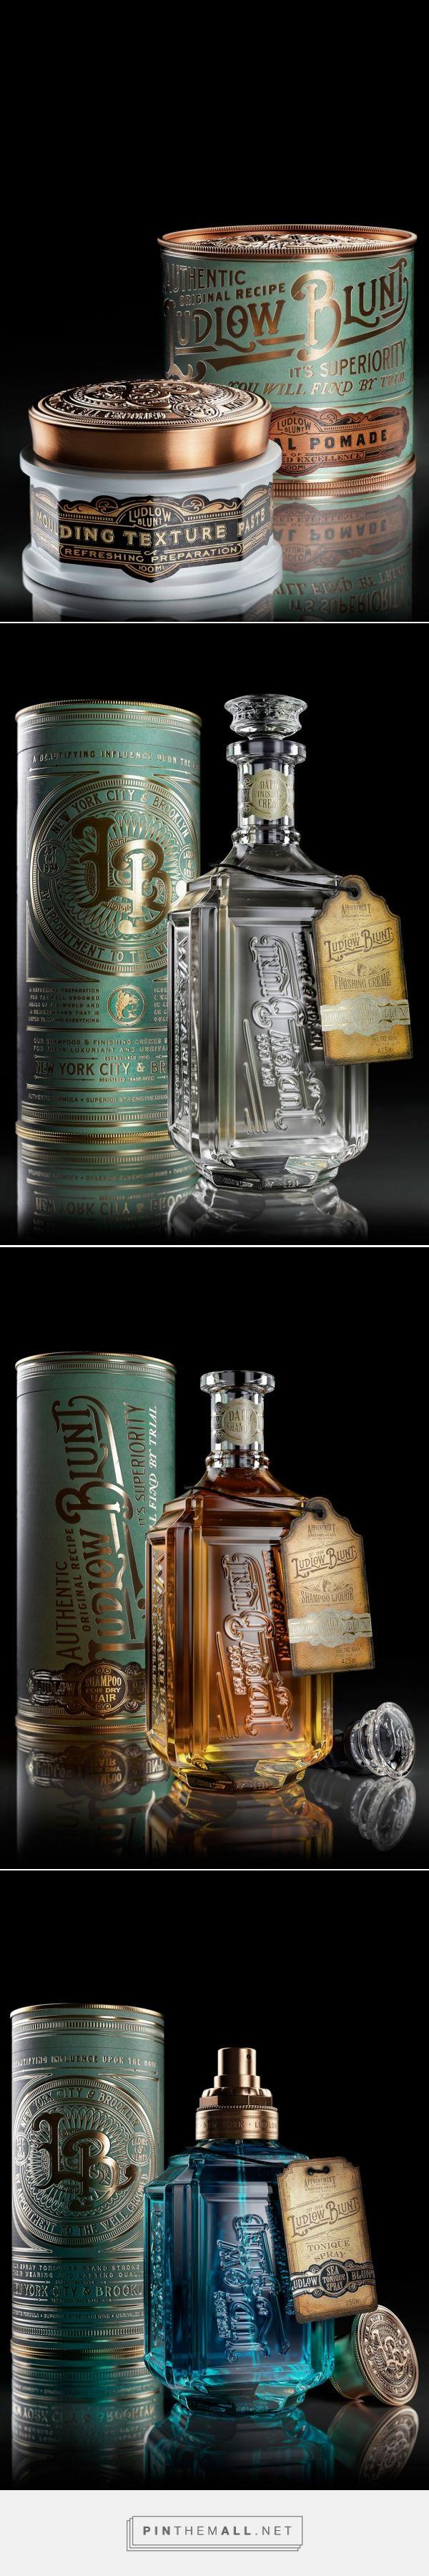 Ludlow Blunt Victorian barbershop packaging design by Stranger & Stranger (USA) -http://www.packagingoftheworld.com/2016/09/ludlow-blunt.html